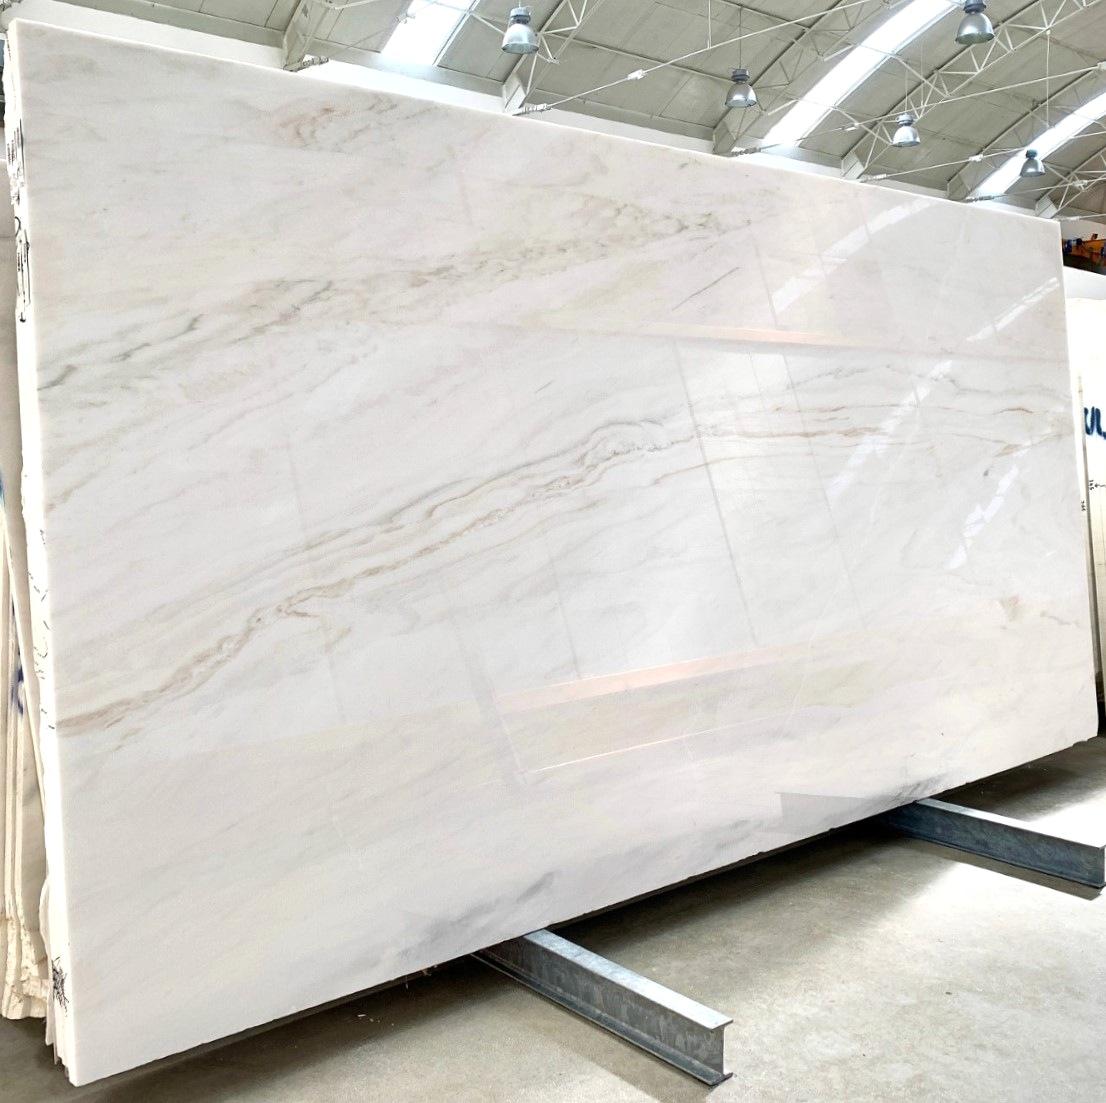 60087 322x166x3cm 6 polished slabs 32